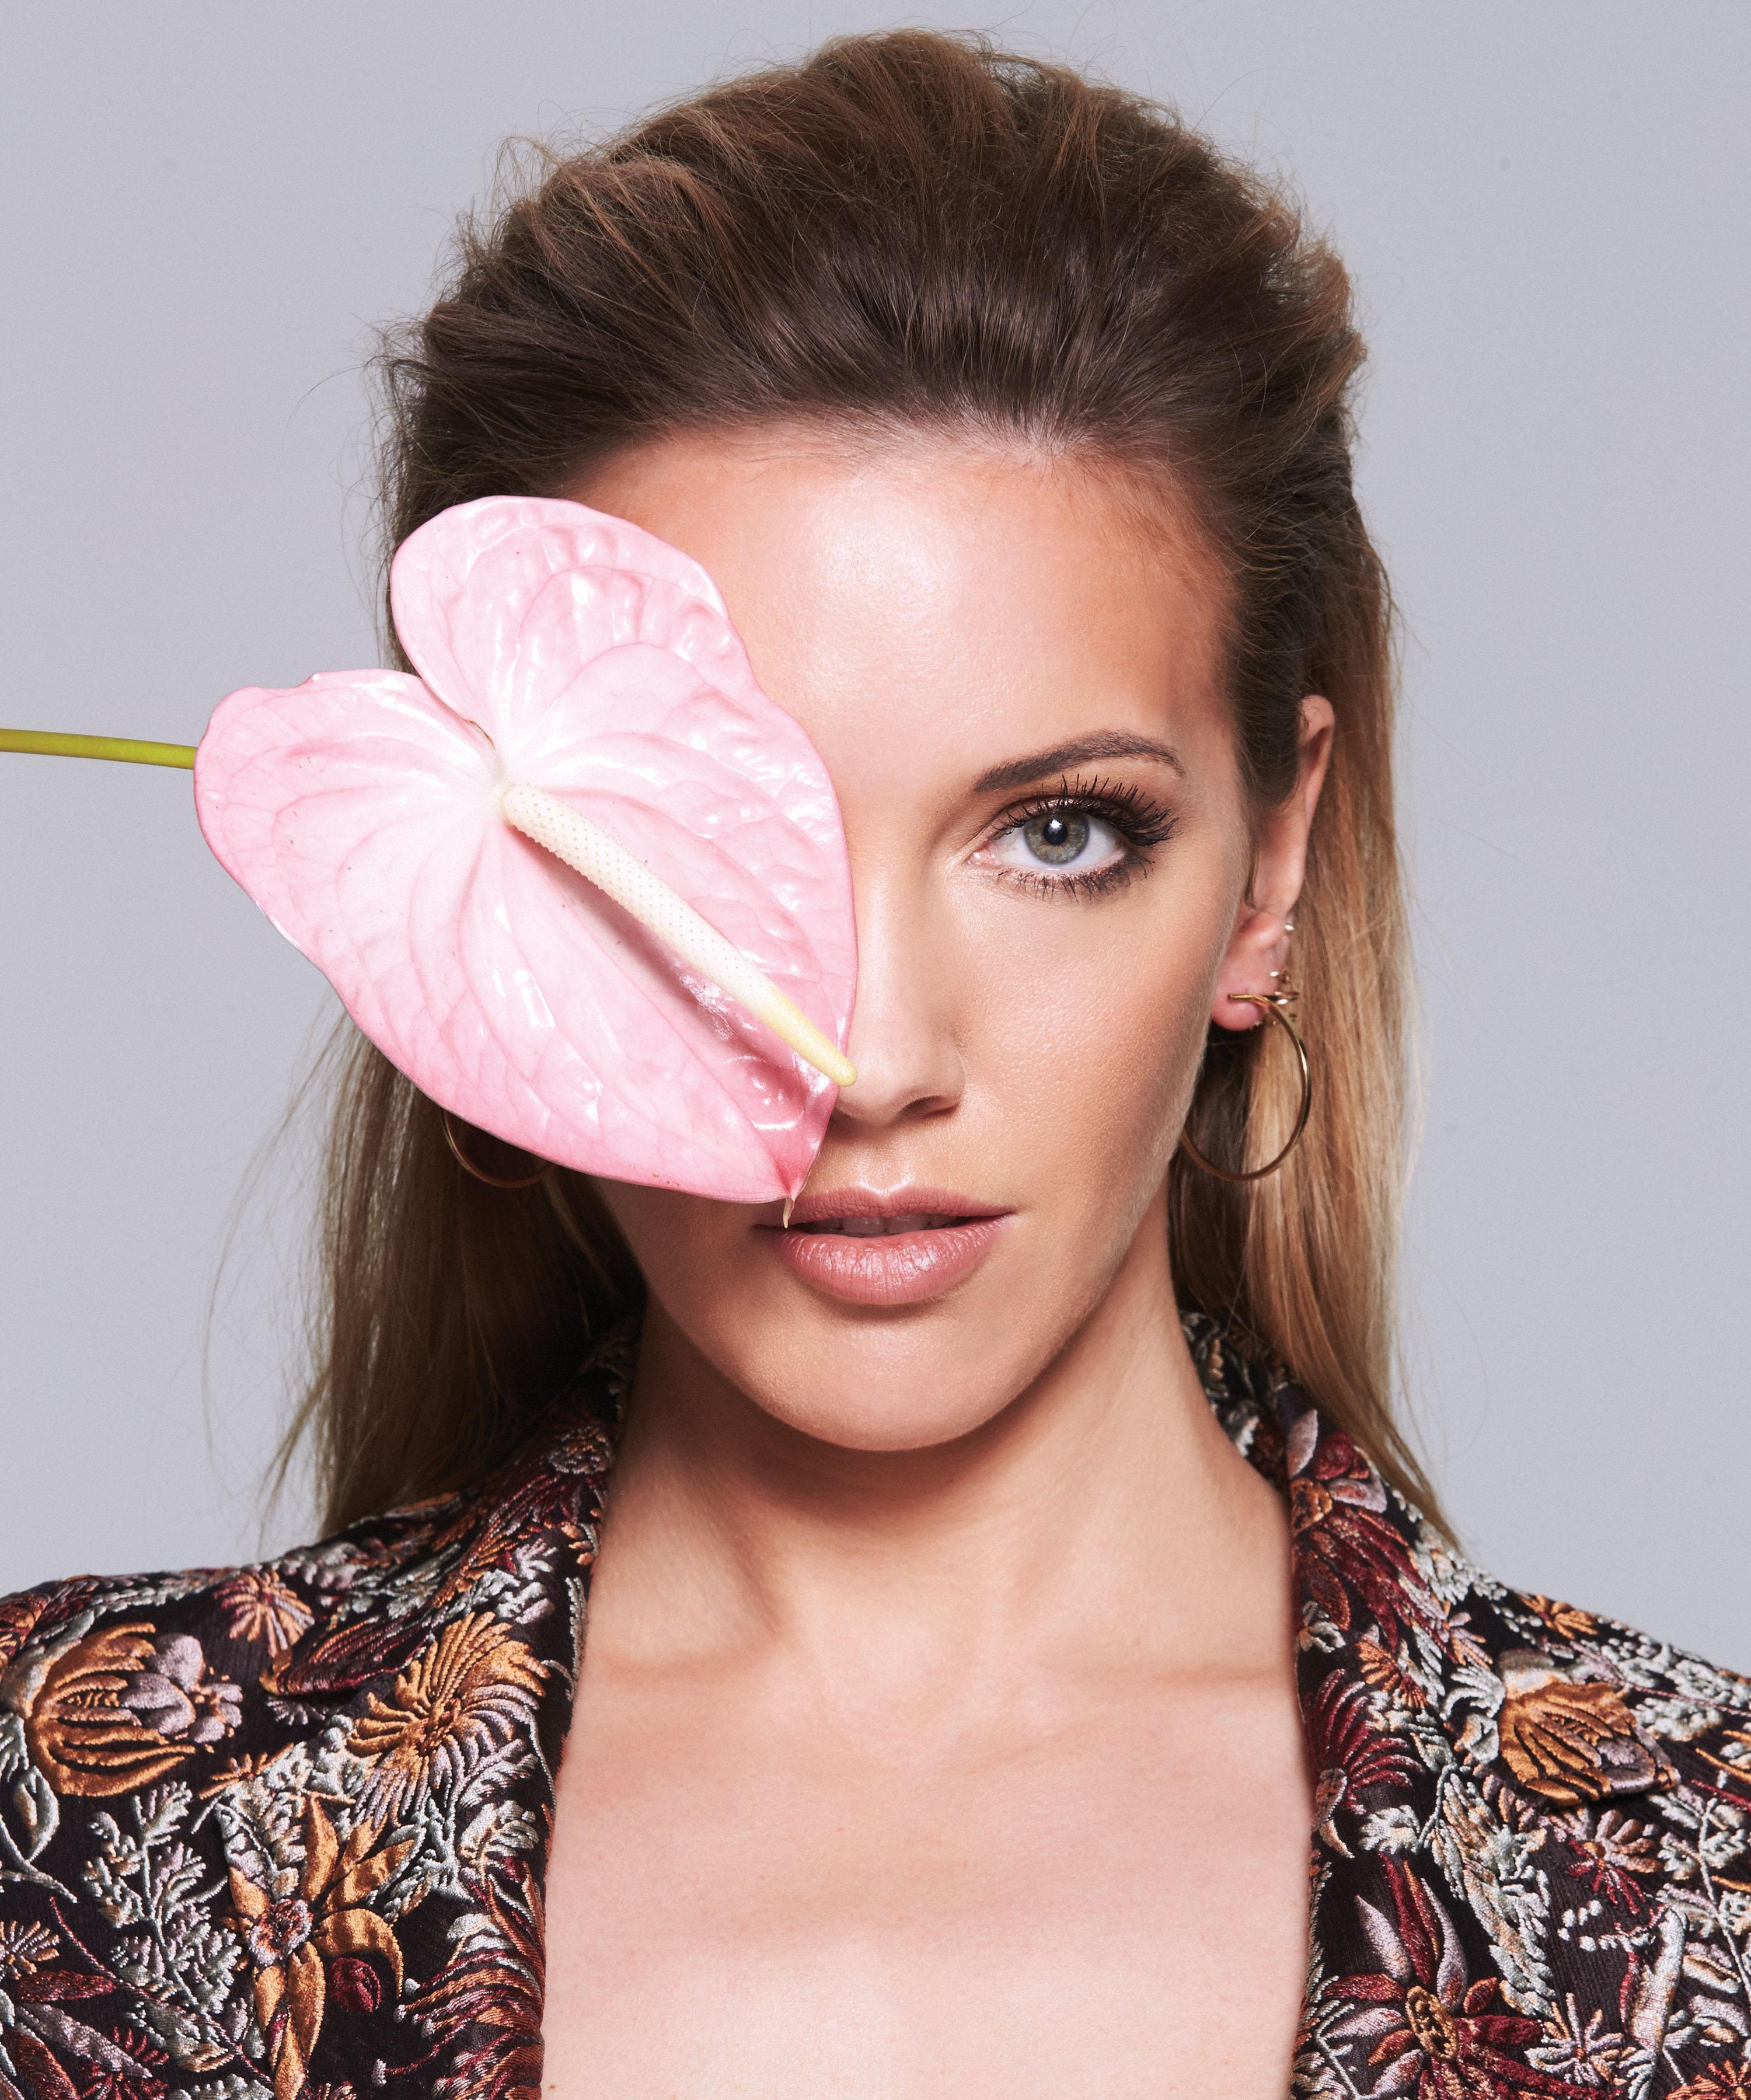 Katie-Cassidy-In-Bloom-Elyssa-Goodman-Masha-Maltsava-Seppe-Tirabassi-Fort-Lauderdale-Venice-Magazine-3